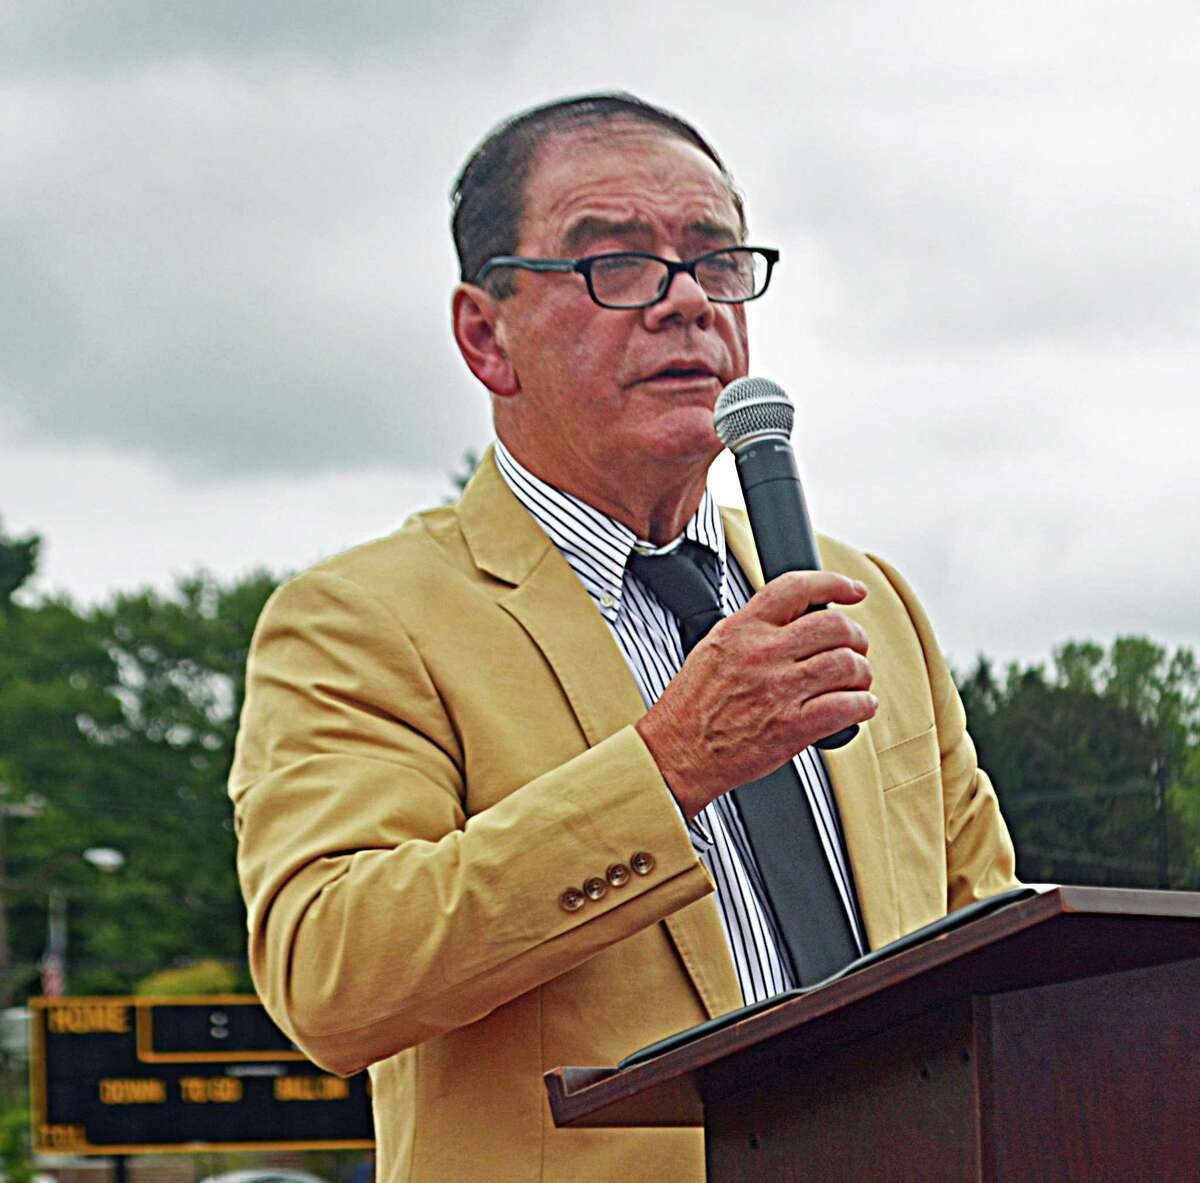 Middletown Common Councilman Eugene Nocera